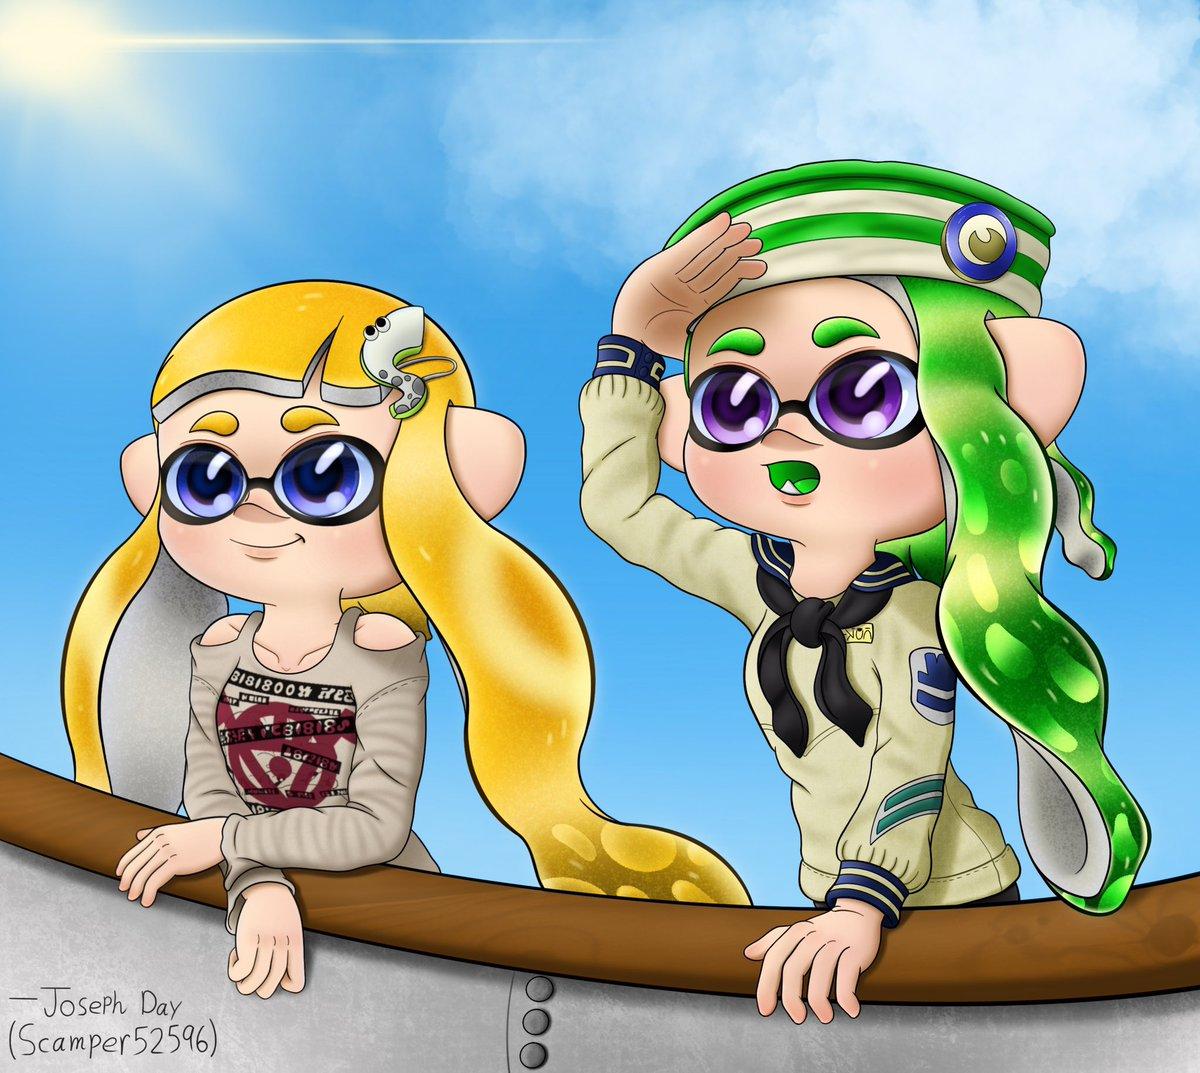 Sailor Jolyne & Shellsea  Peering out into the horizon always makes for a serene moment. Just hoping no one falls into the water...  #Splatoon #Splatoon2 #Nintendo #splatoonart #SplatArt #Inkling #digitalartwork #artistsontwitter